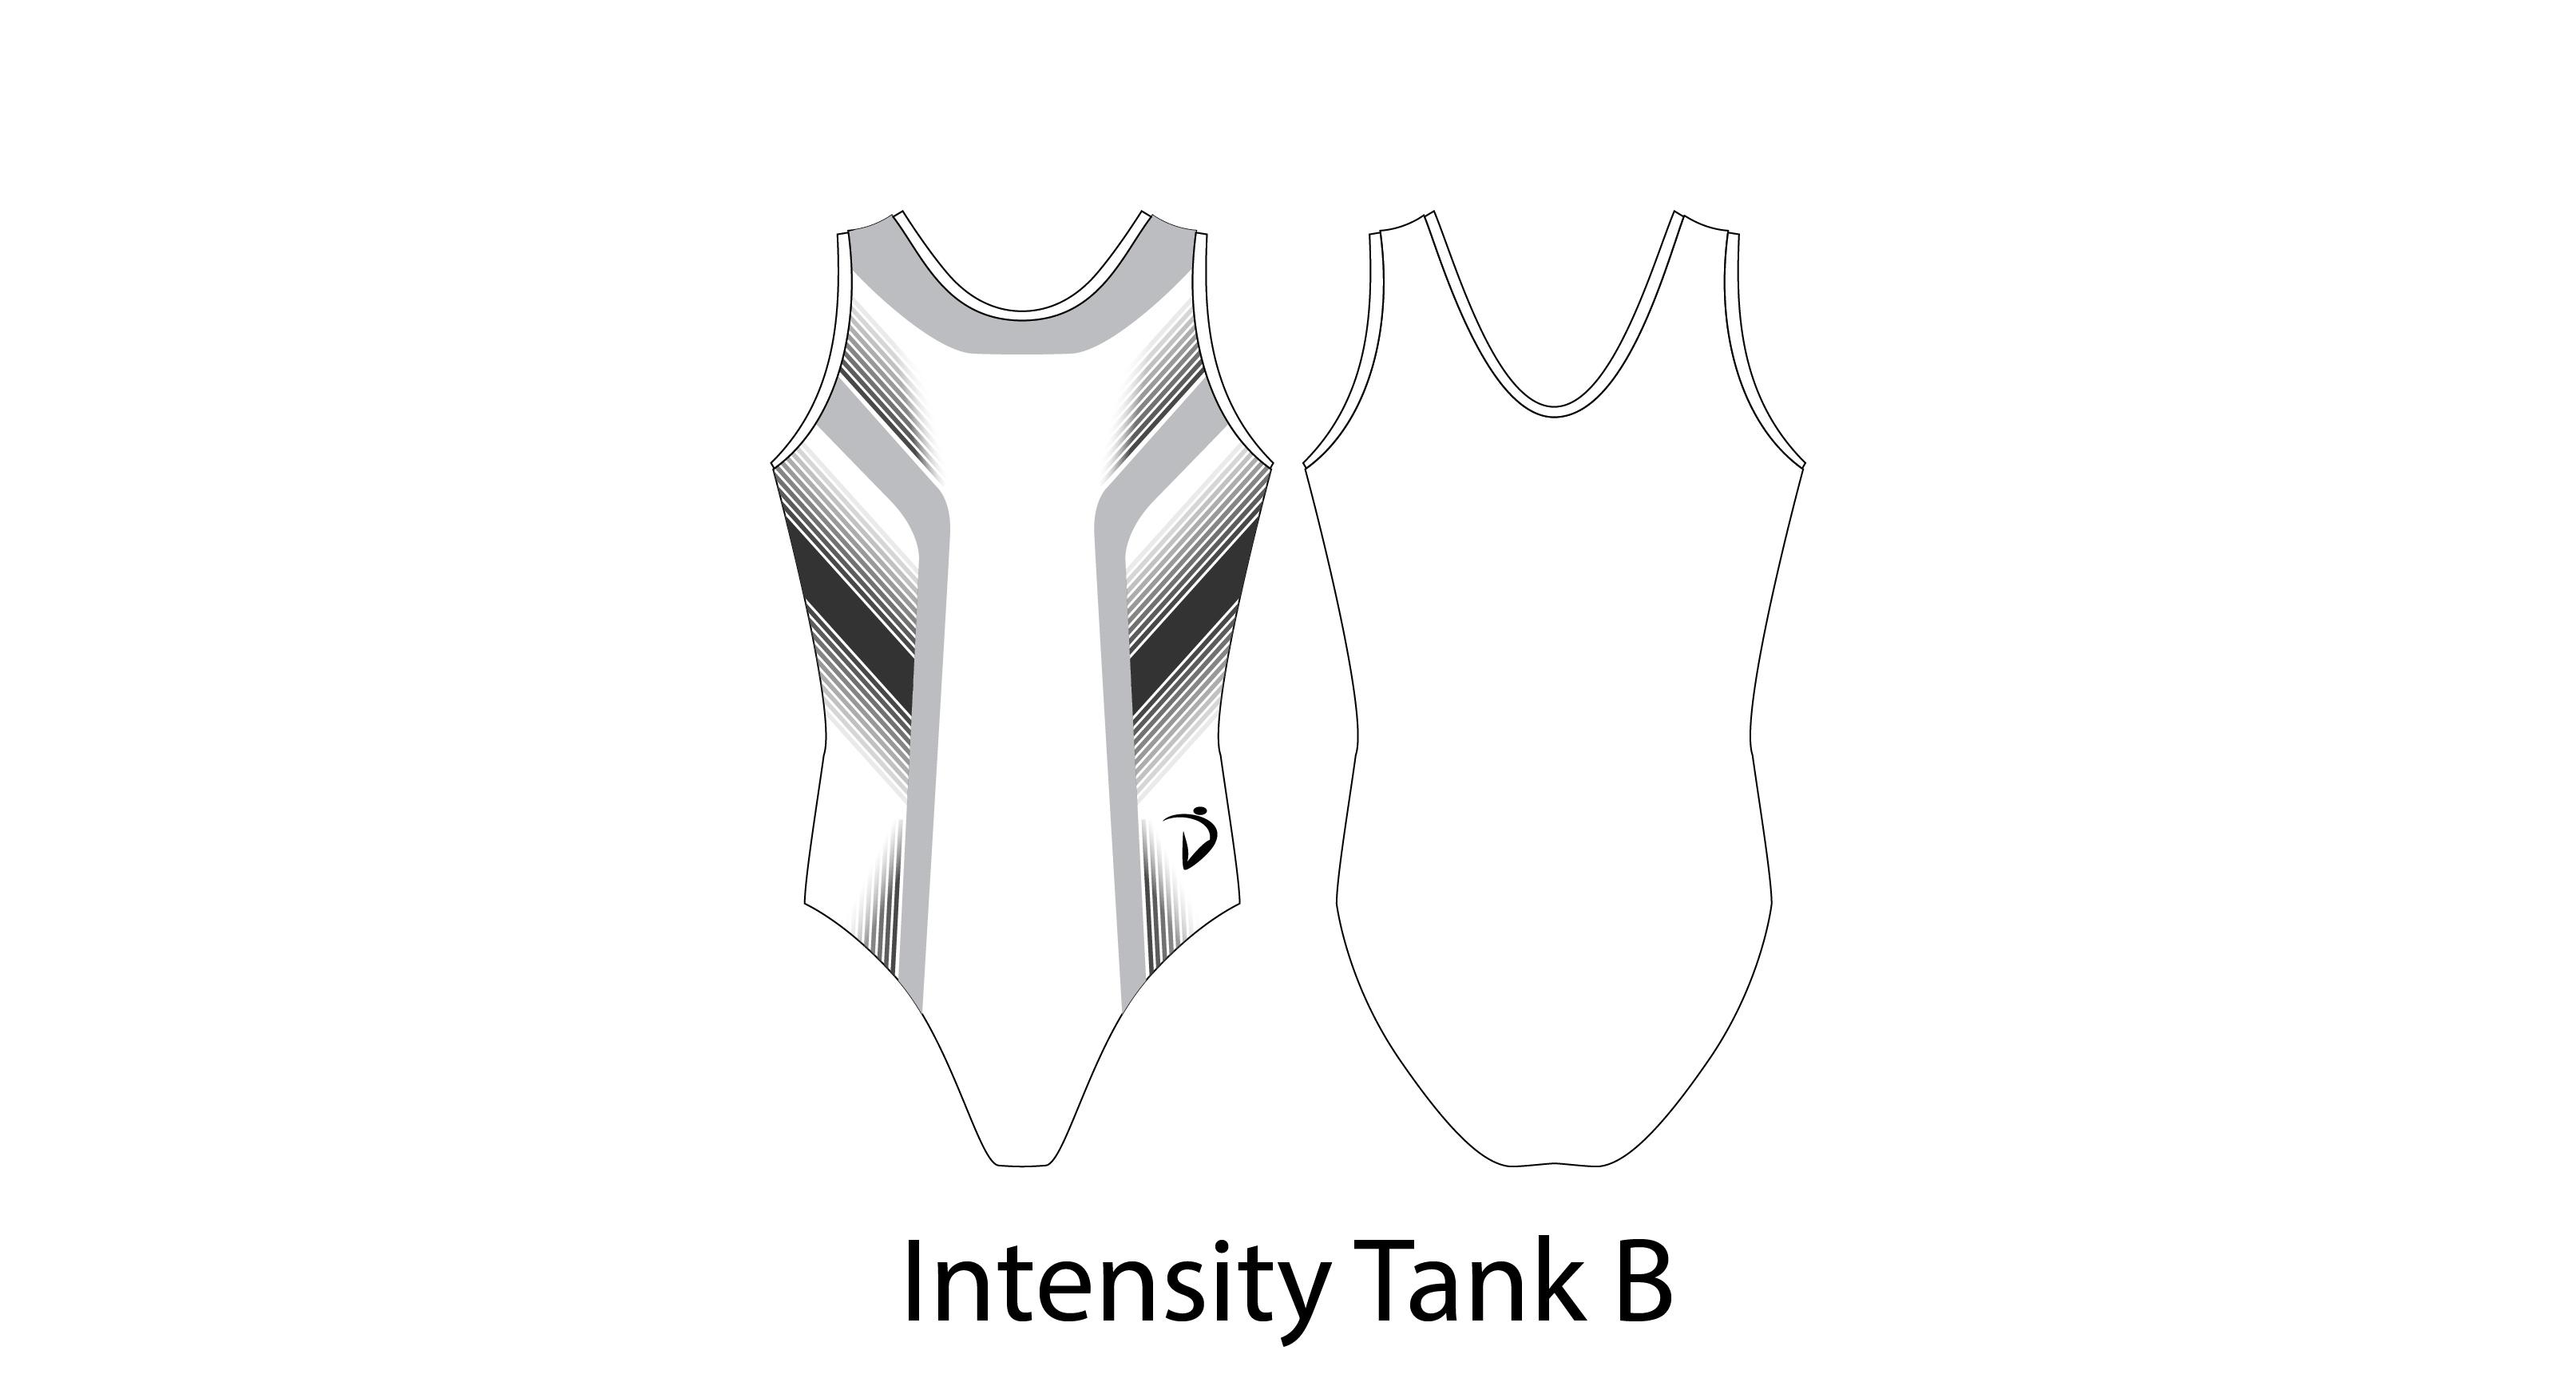 Intensity Tank B